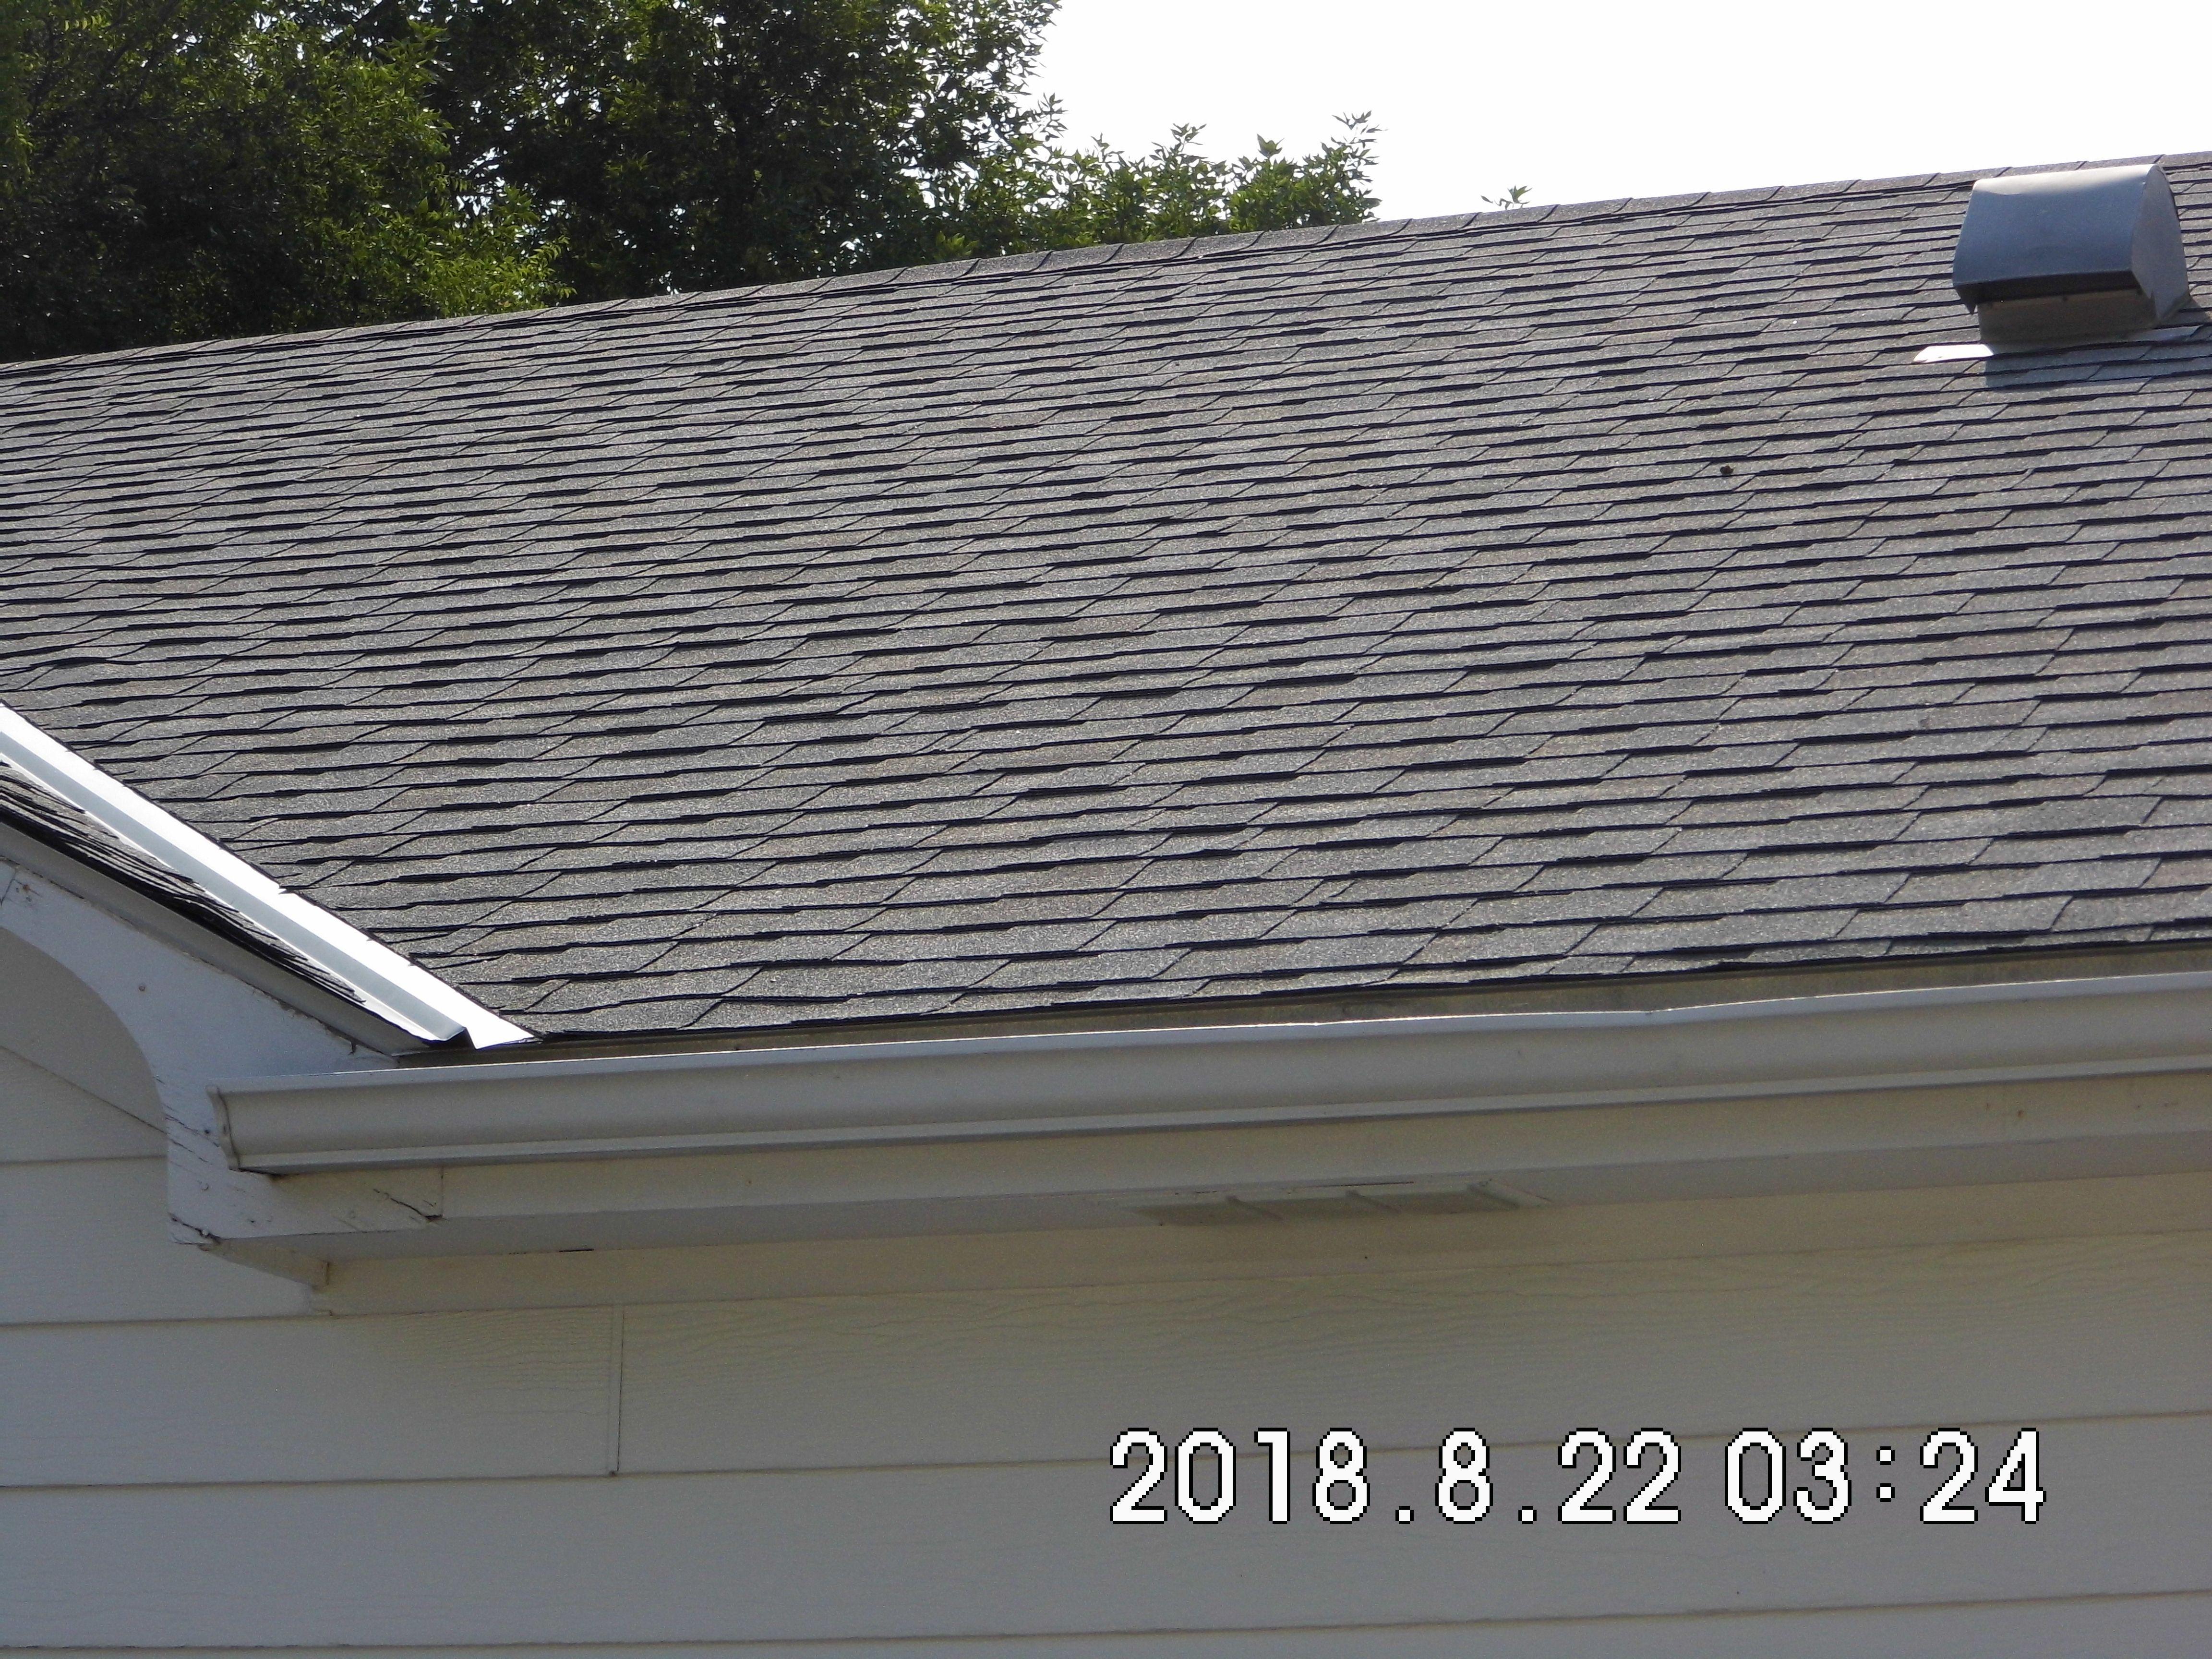 1.10 303 Elm St. North Roof